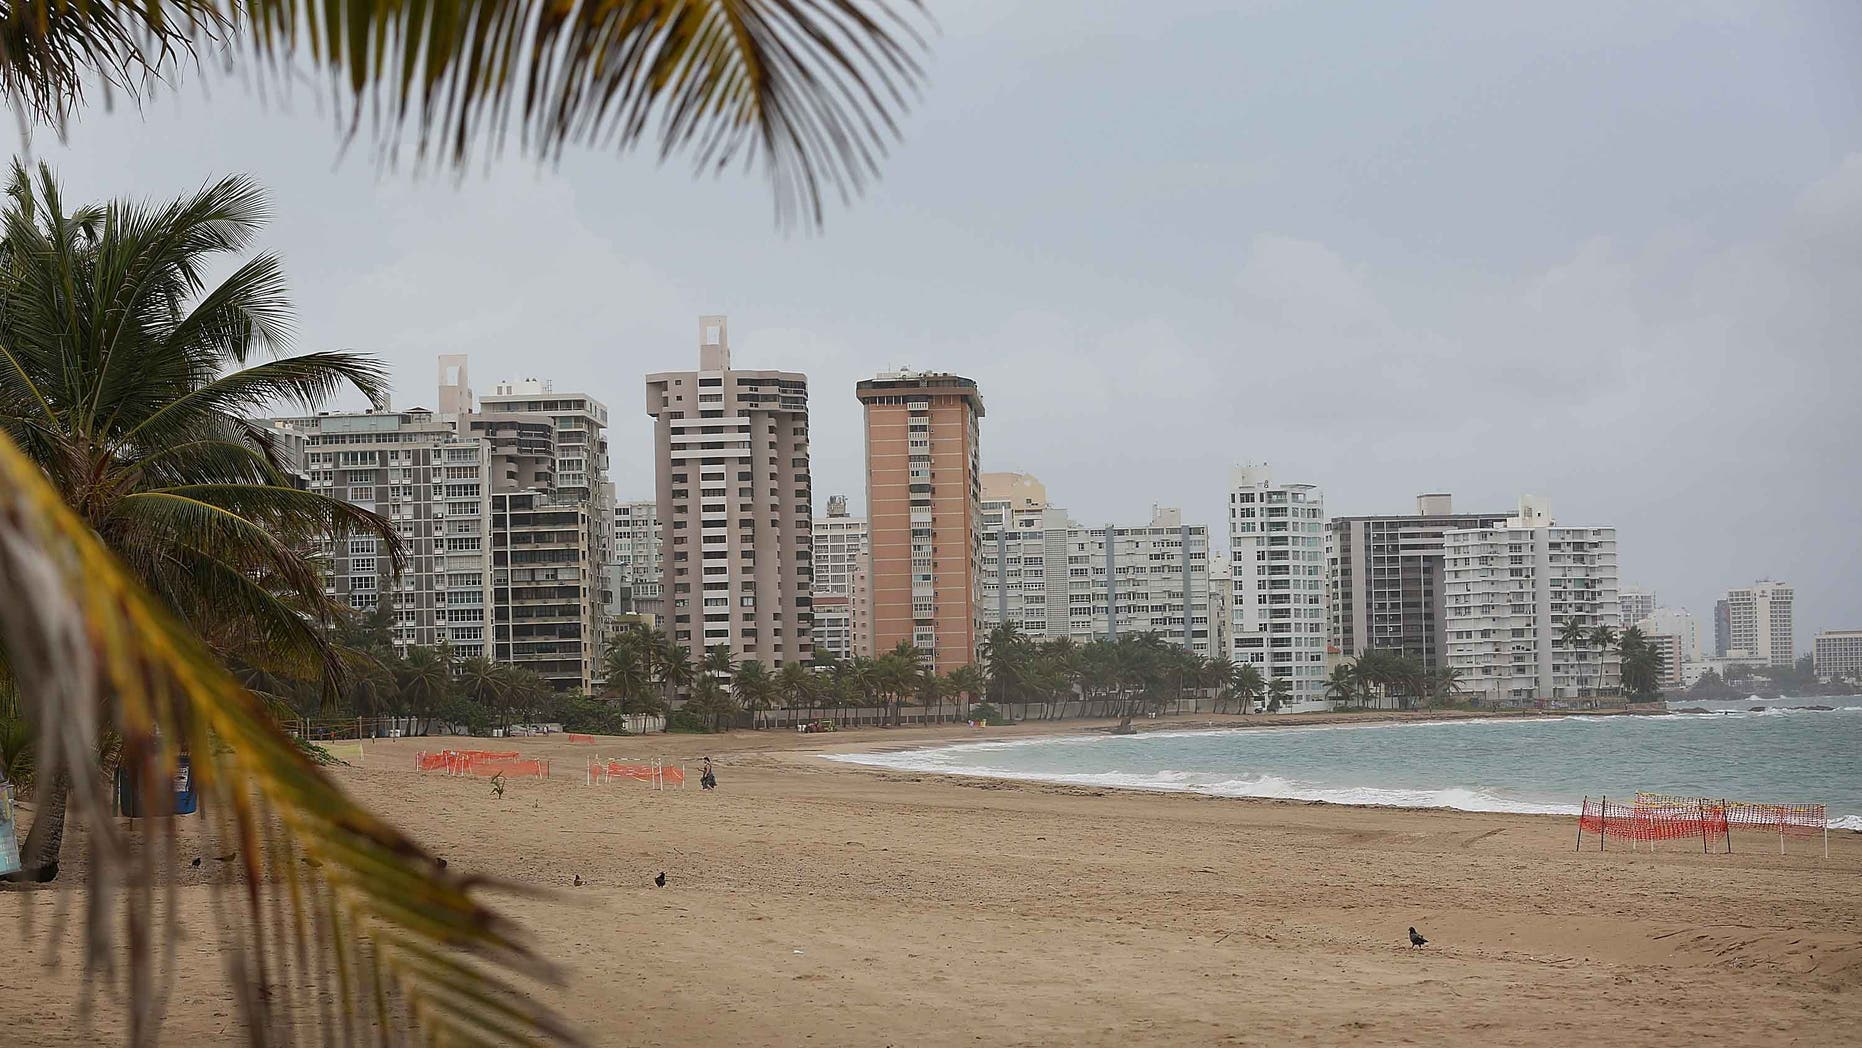 Empty beach in San Juan, Puerto Rico, on July 1, 2015.